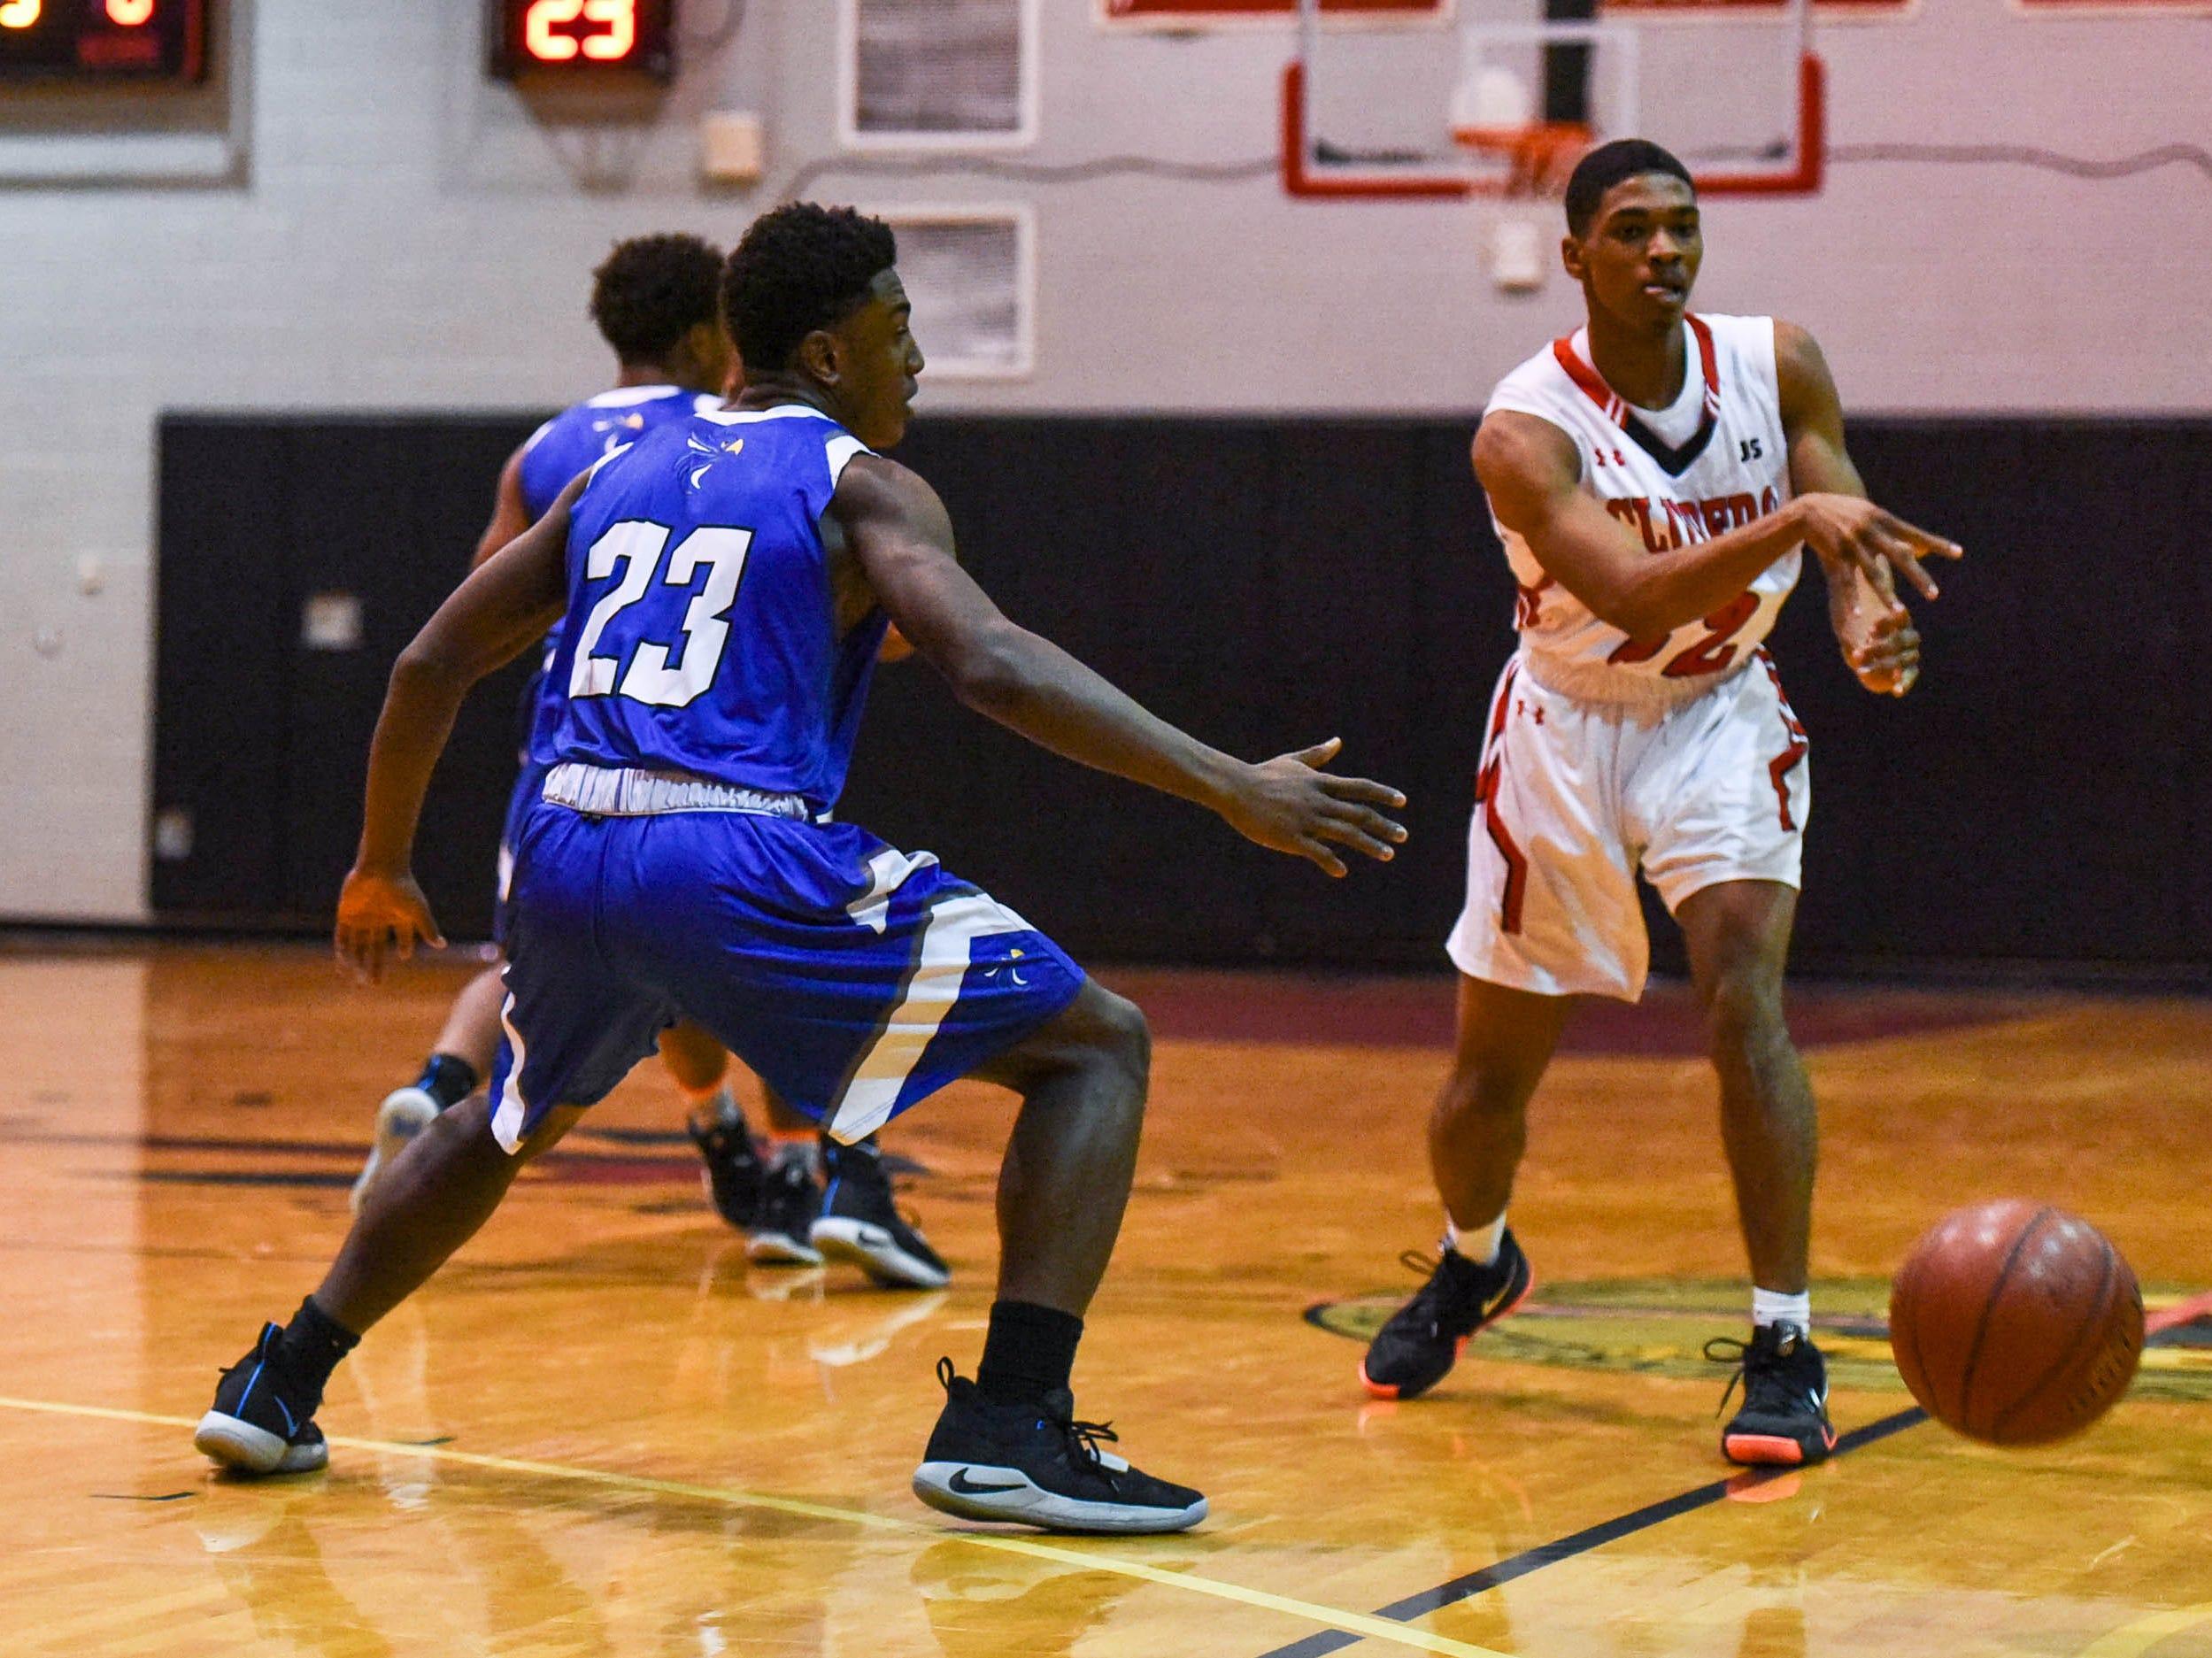 Bennett's Jyrin Harmon (22) passes the ball during a game against Decatur at Bennett High School in Salisbury on Thursday, Jan 3, 2018.